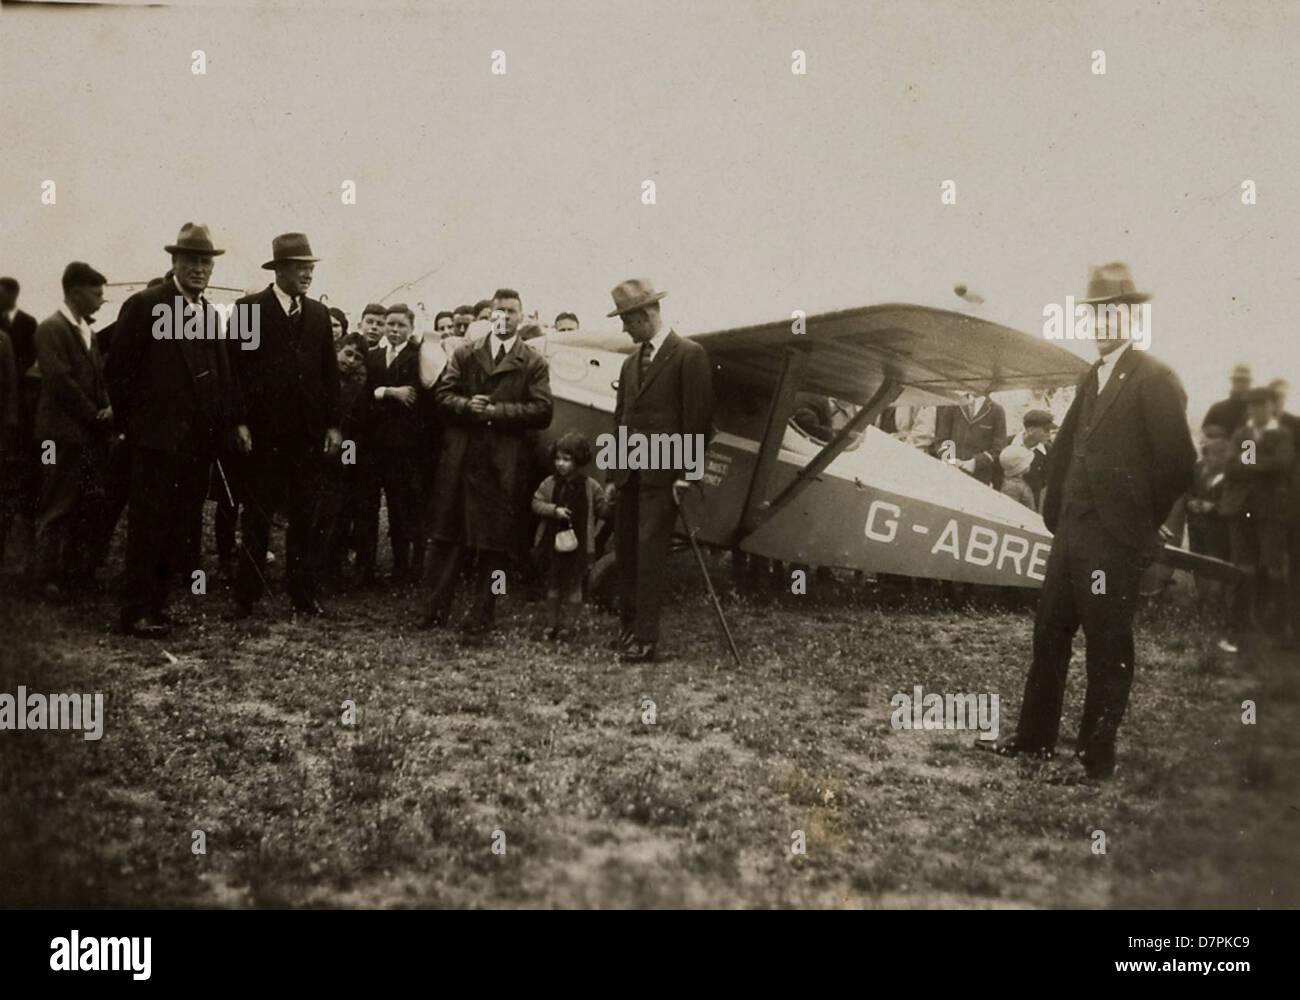 Arthur Butler and crowd near Comper Swift aeroplane G-ABRE, 1931 - Stock Image